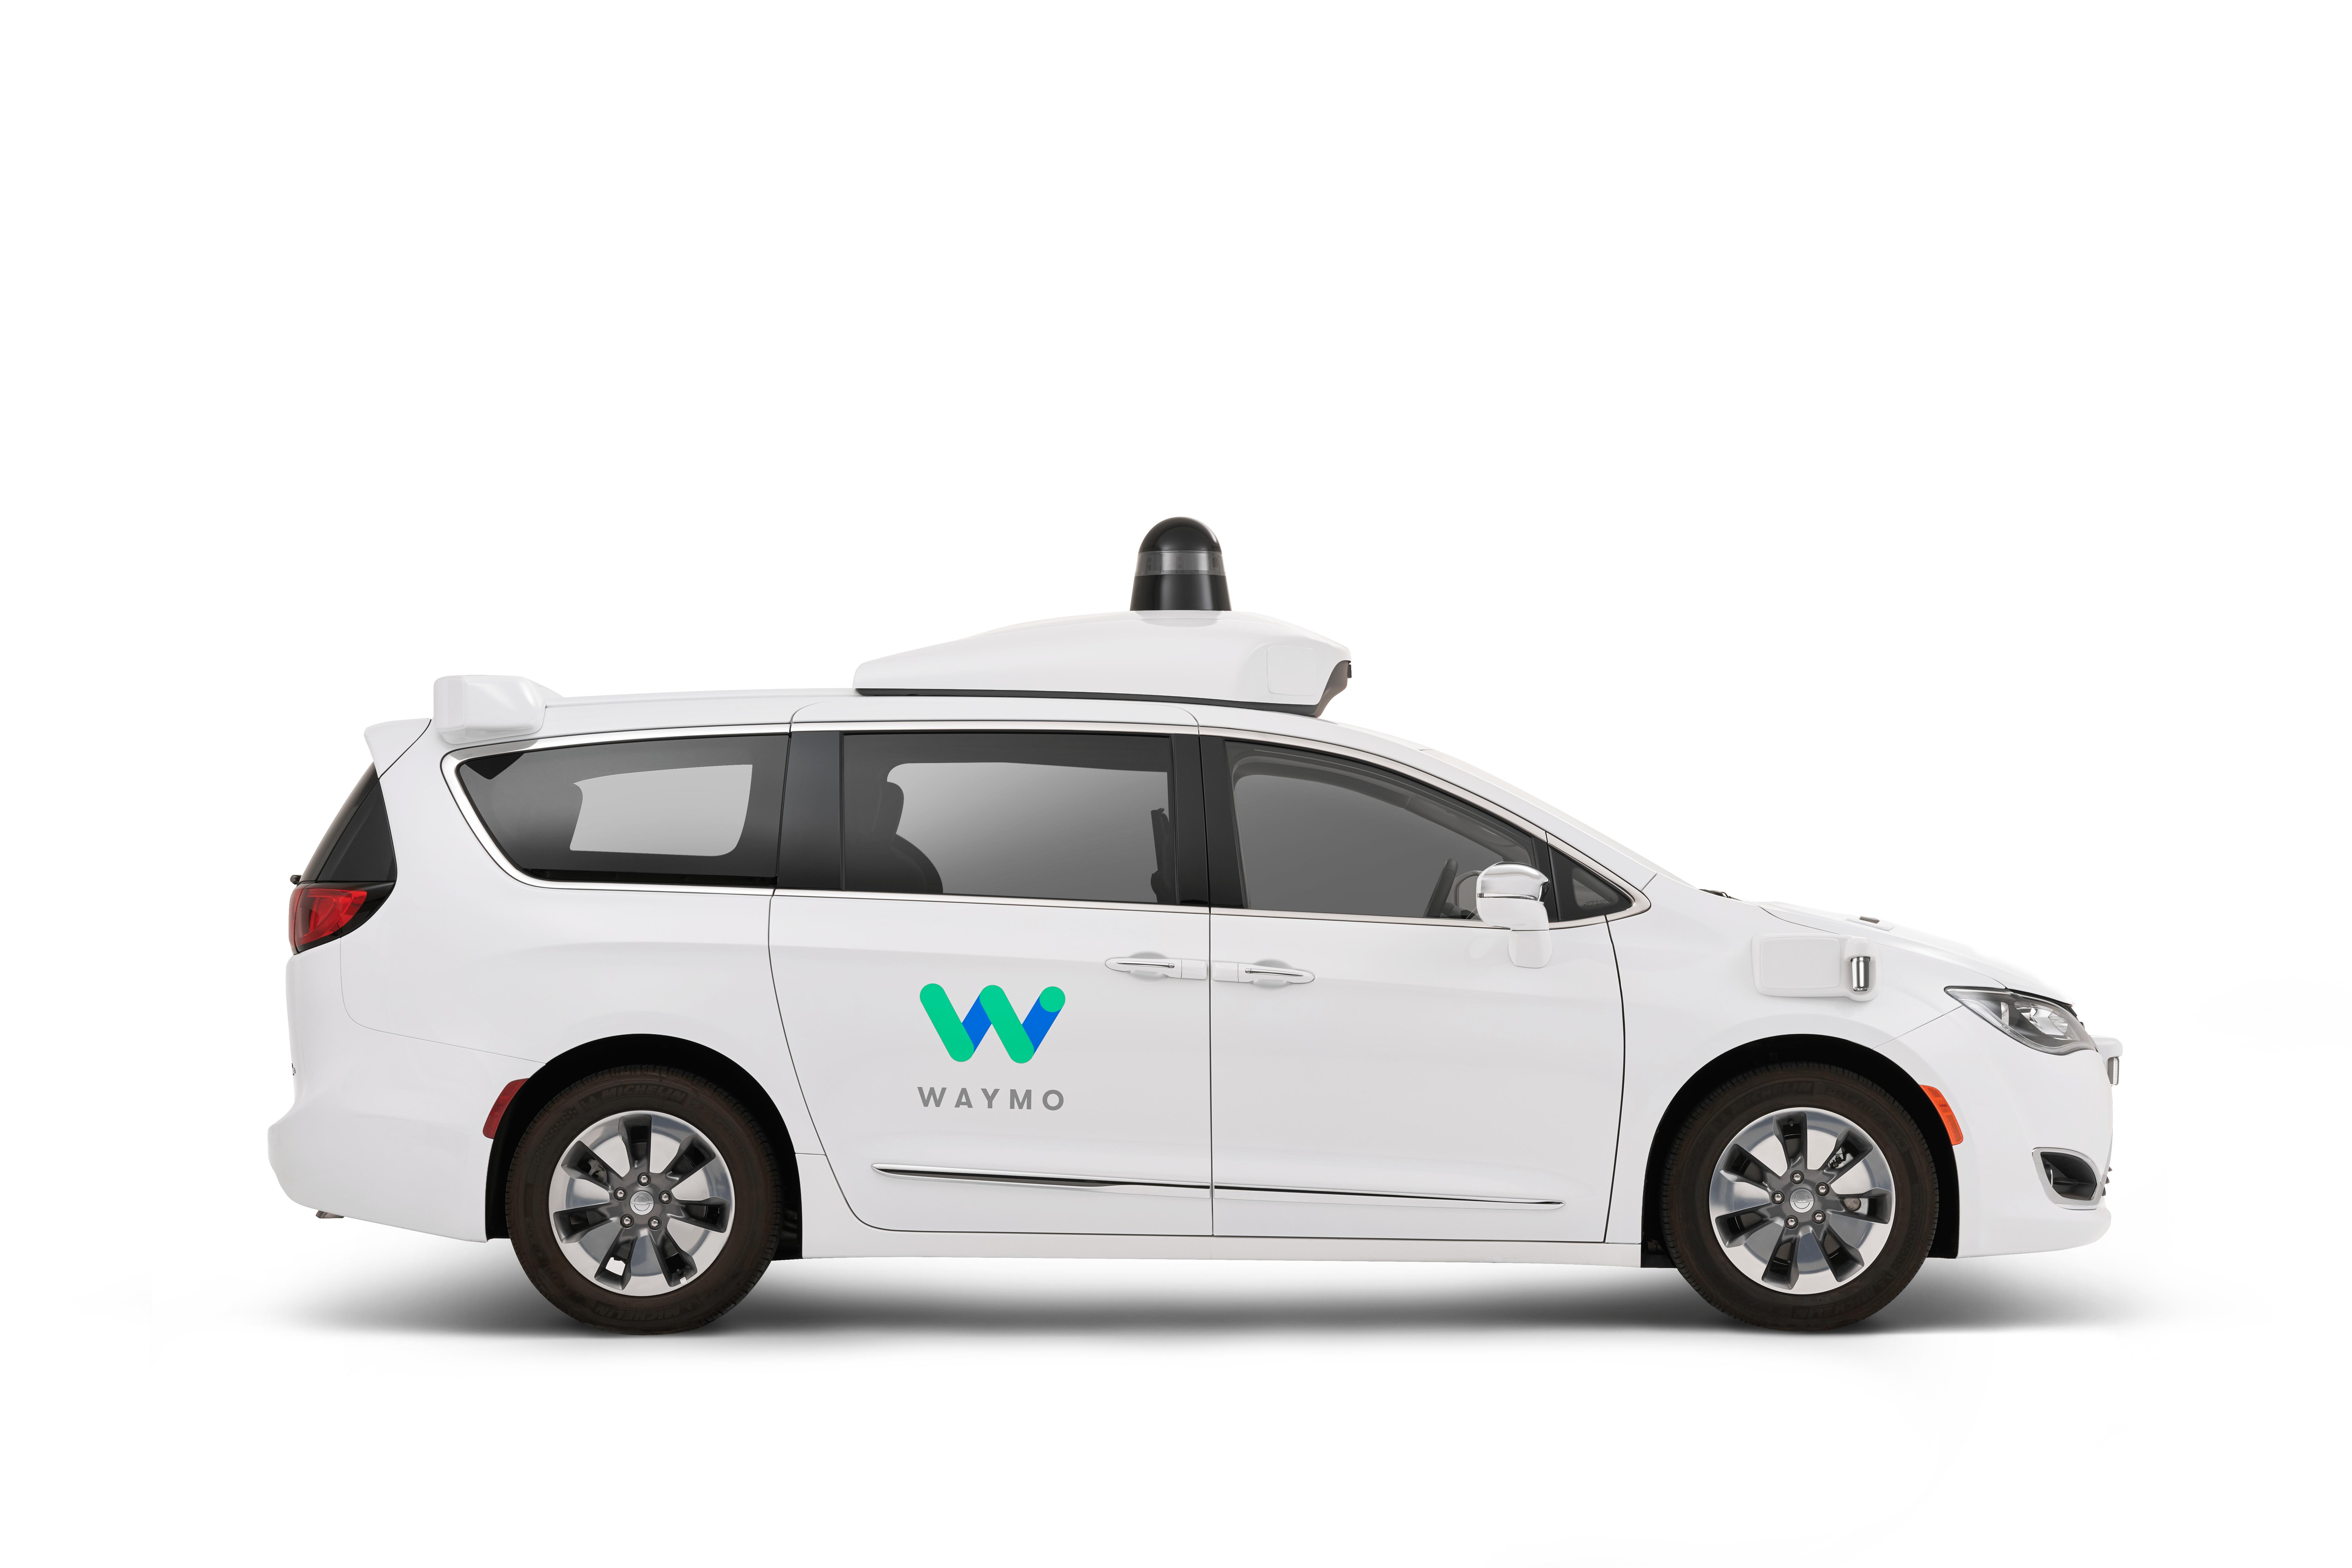 Waymo's autonomously driven Chrysler Pacifica Hybrid minivan